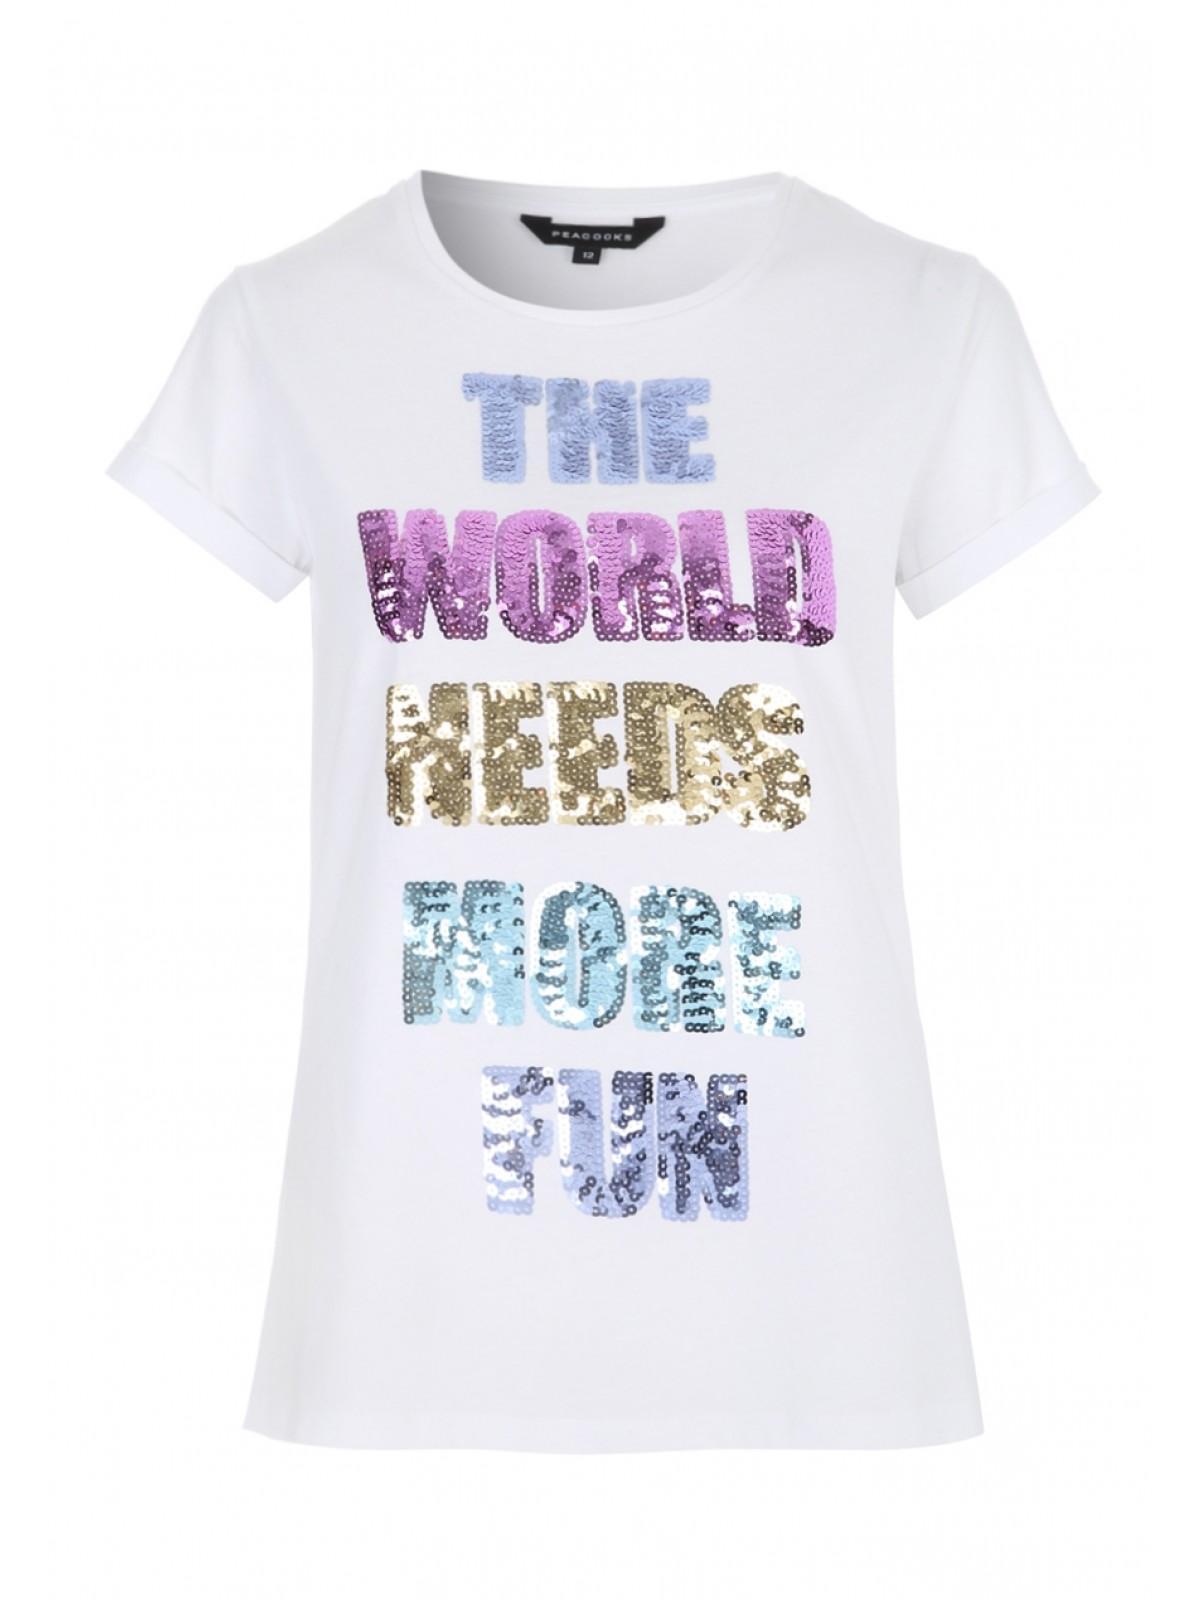 c43990674859 Womens White Sequin Slogan T-Shirt   Peacocks